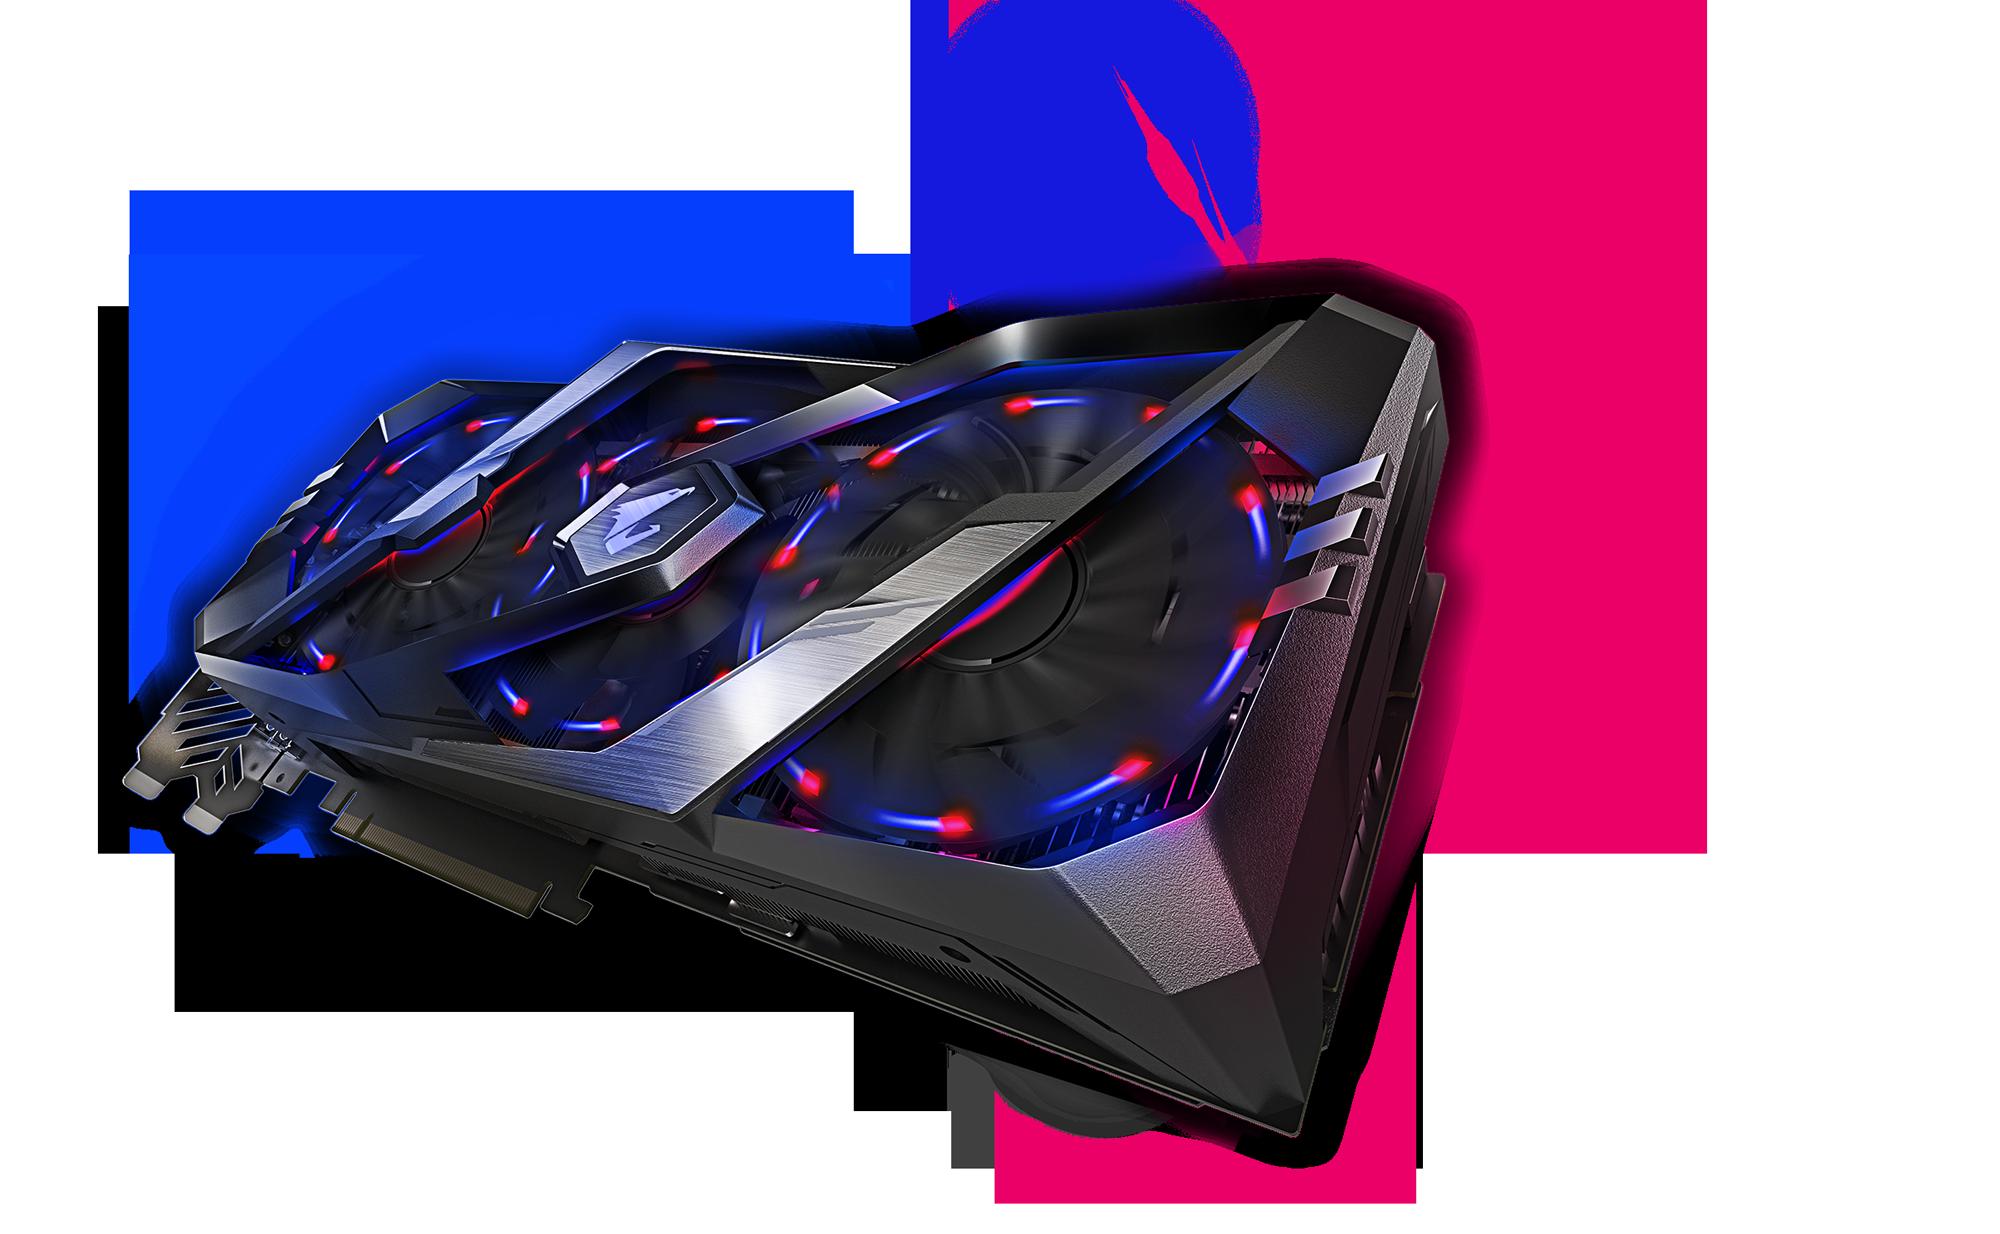 AORUS GeForce RTX™ 2070 XTREME 8G | Graphics Card - GIGABYTE